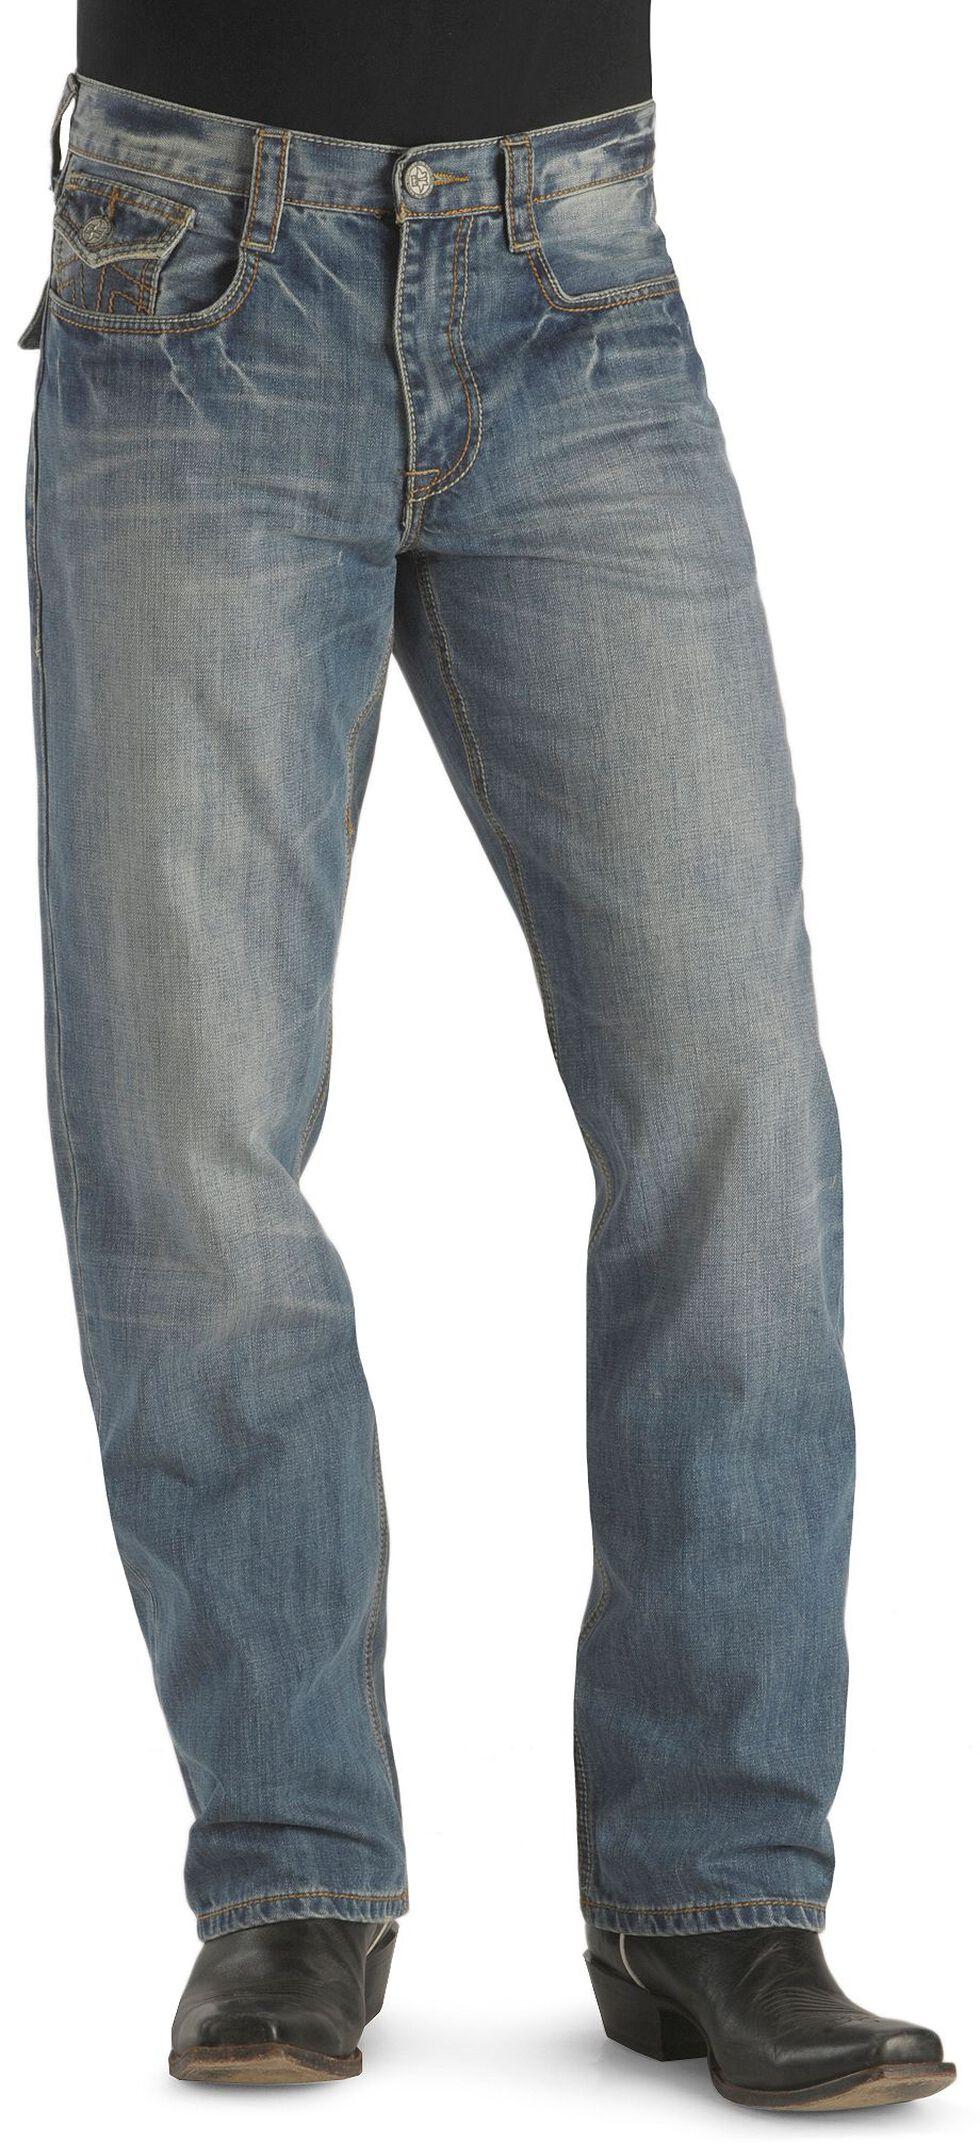 Tin Haul Regular Joe Flap Pocket Jeans, Blue, hi-res